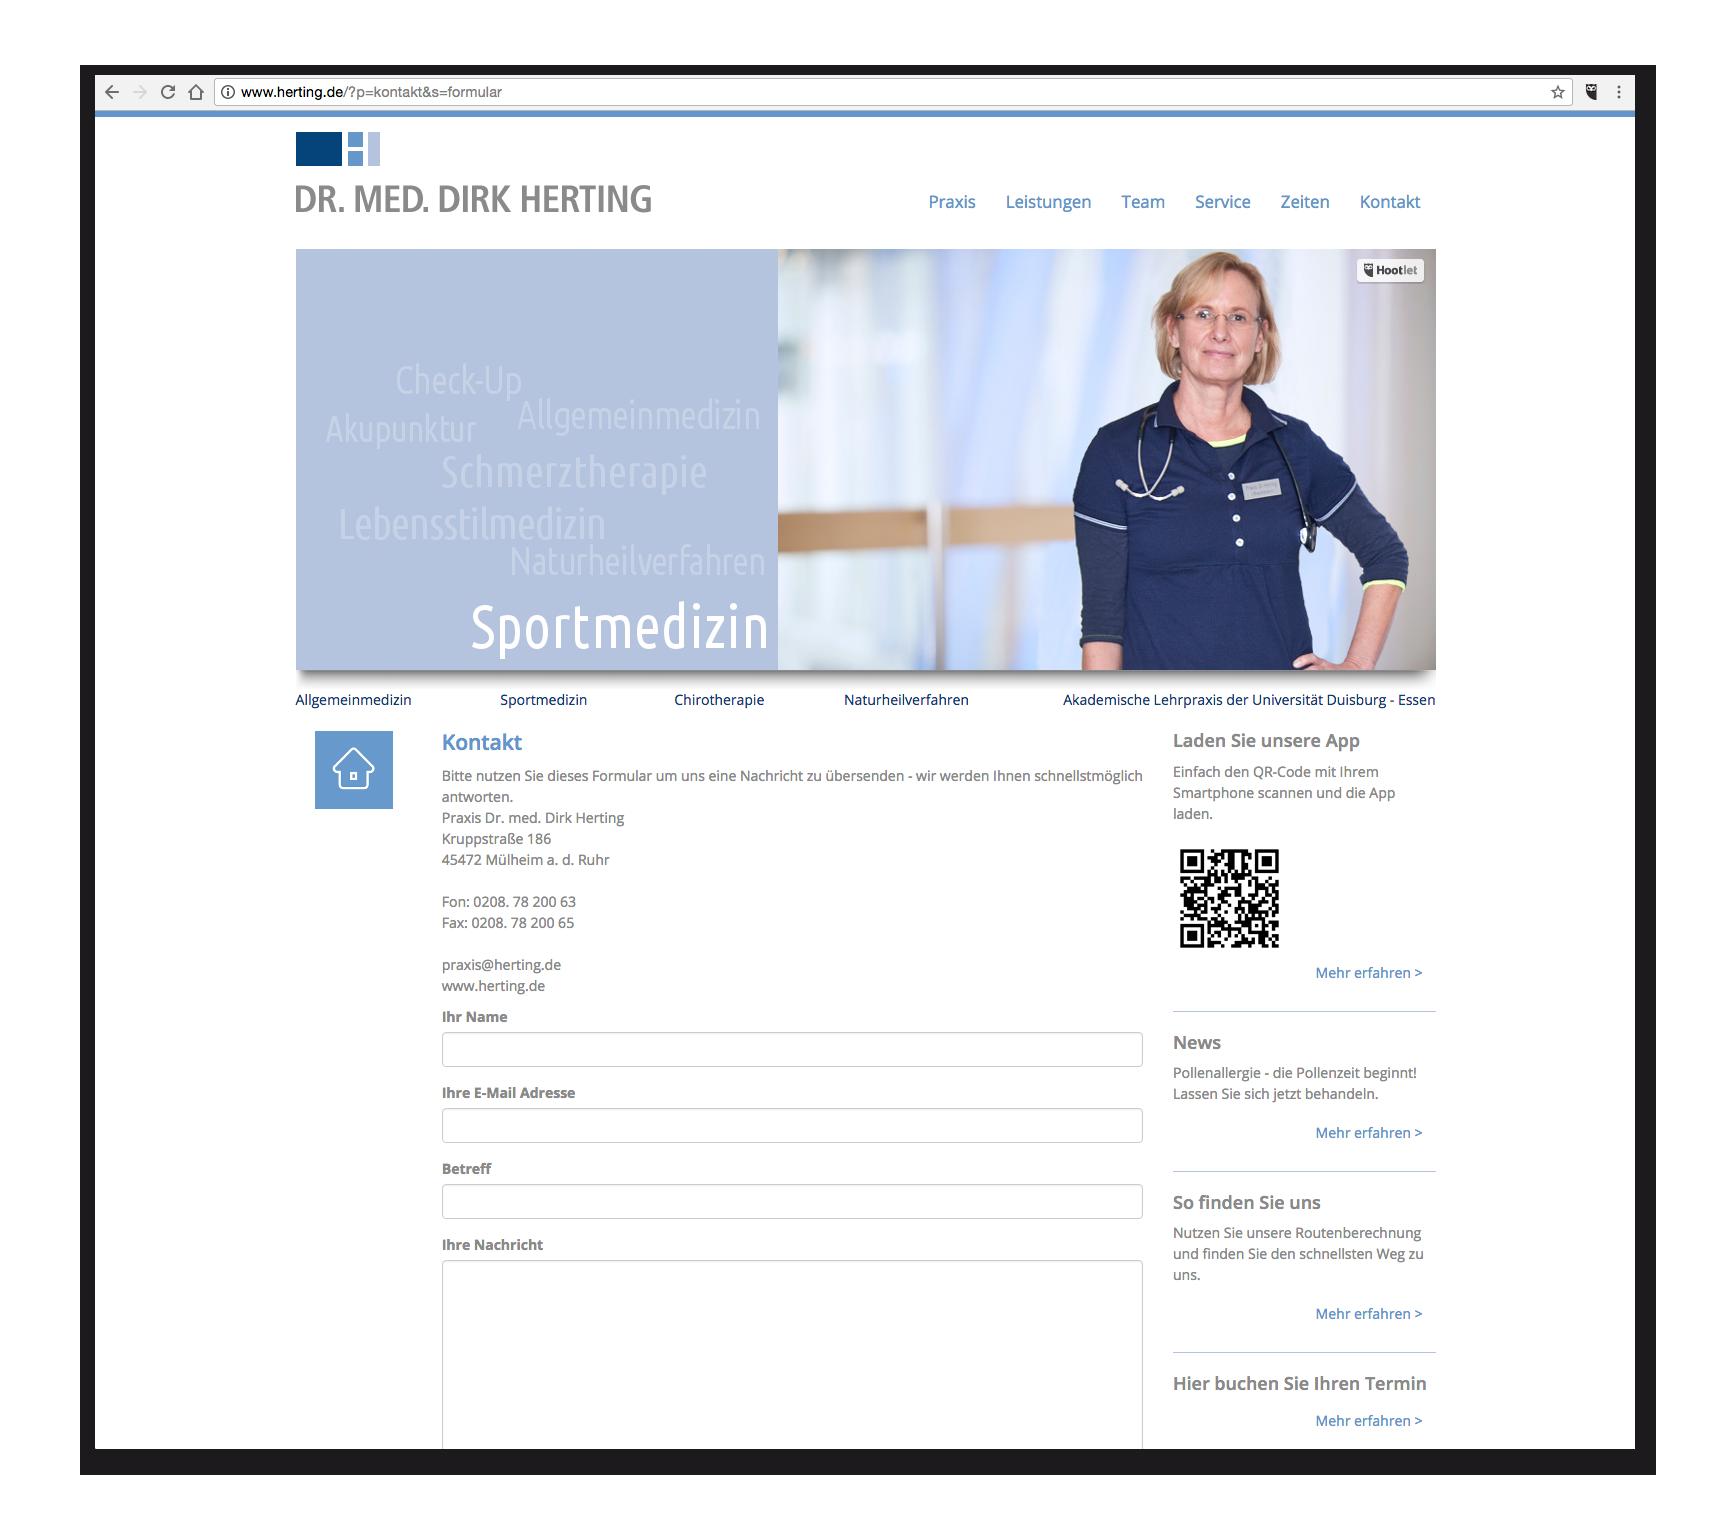 Praxis-Webseite - Kontakt